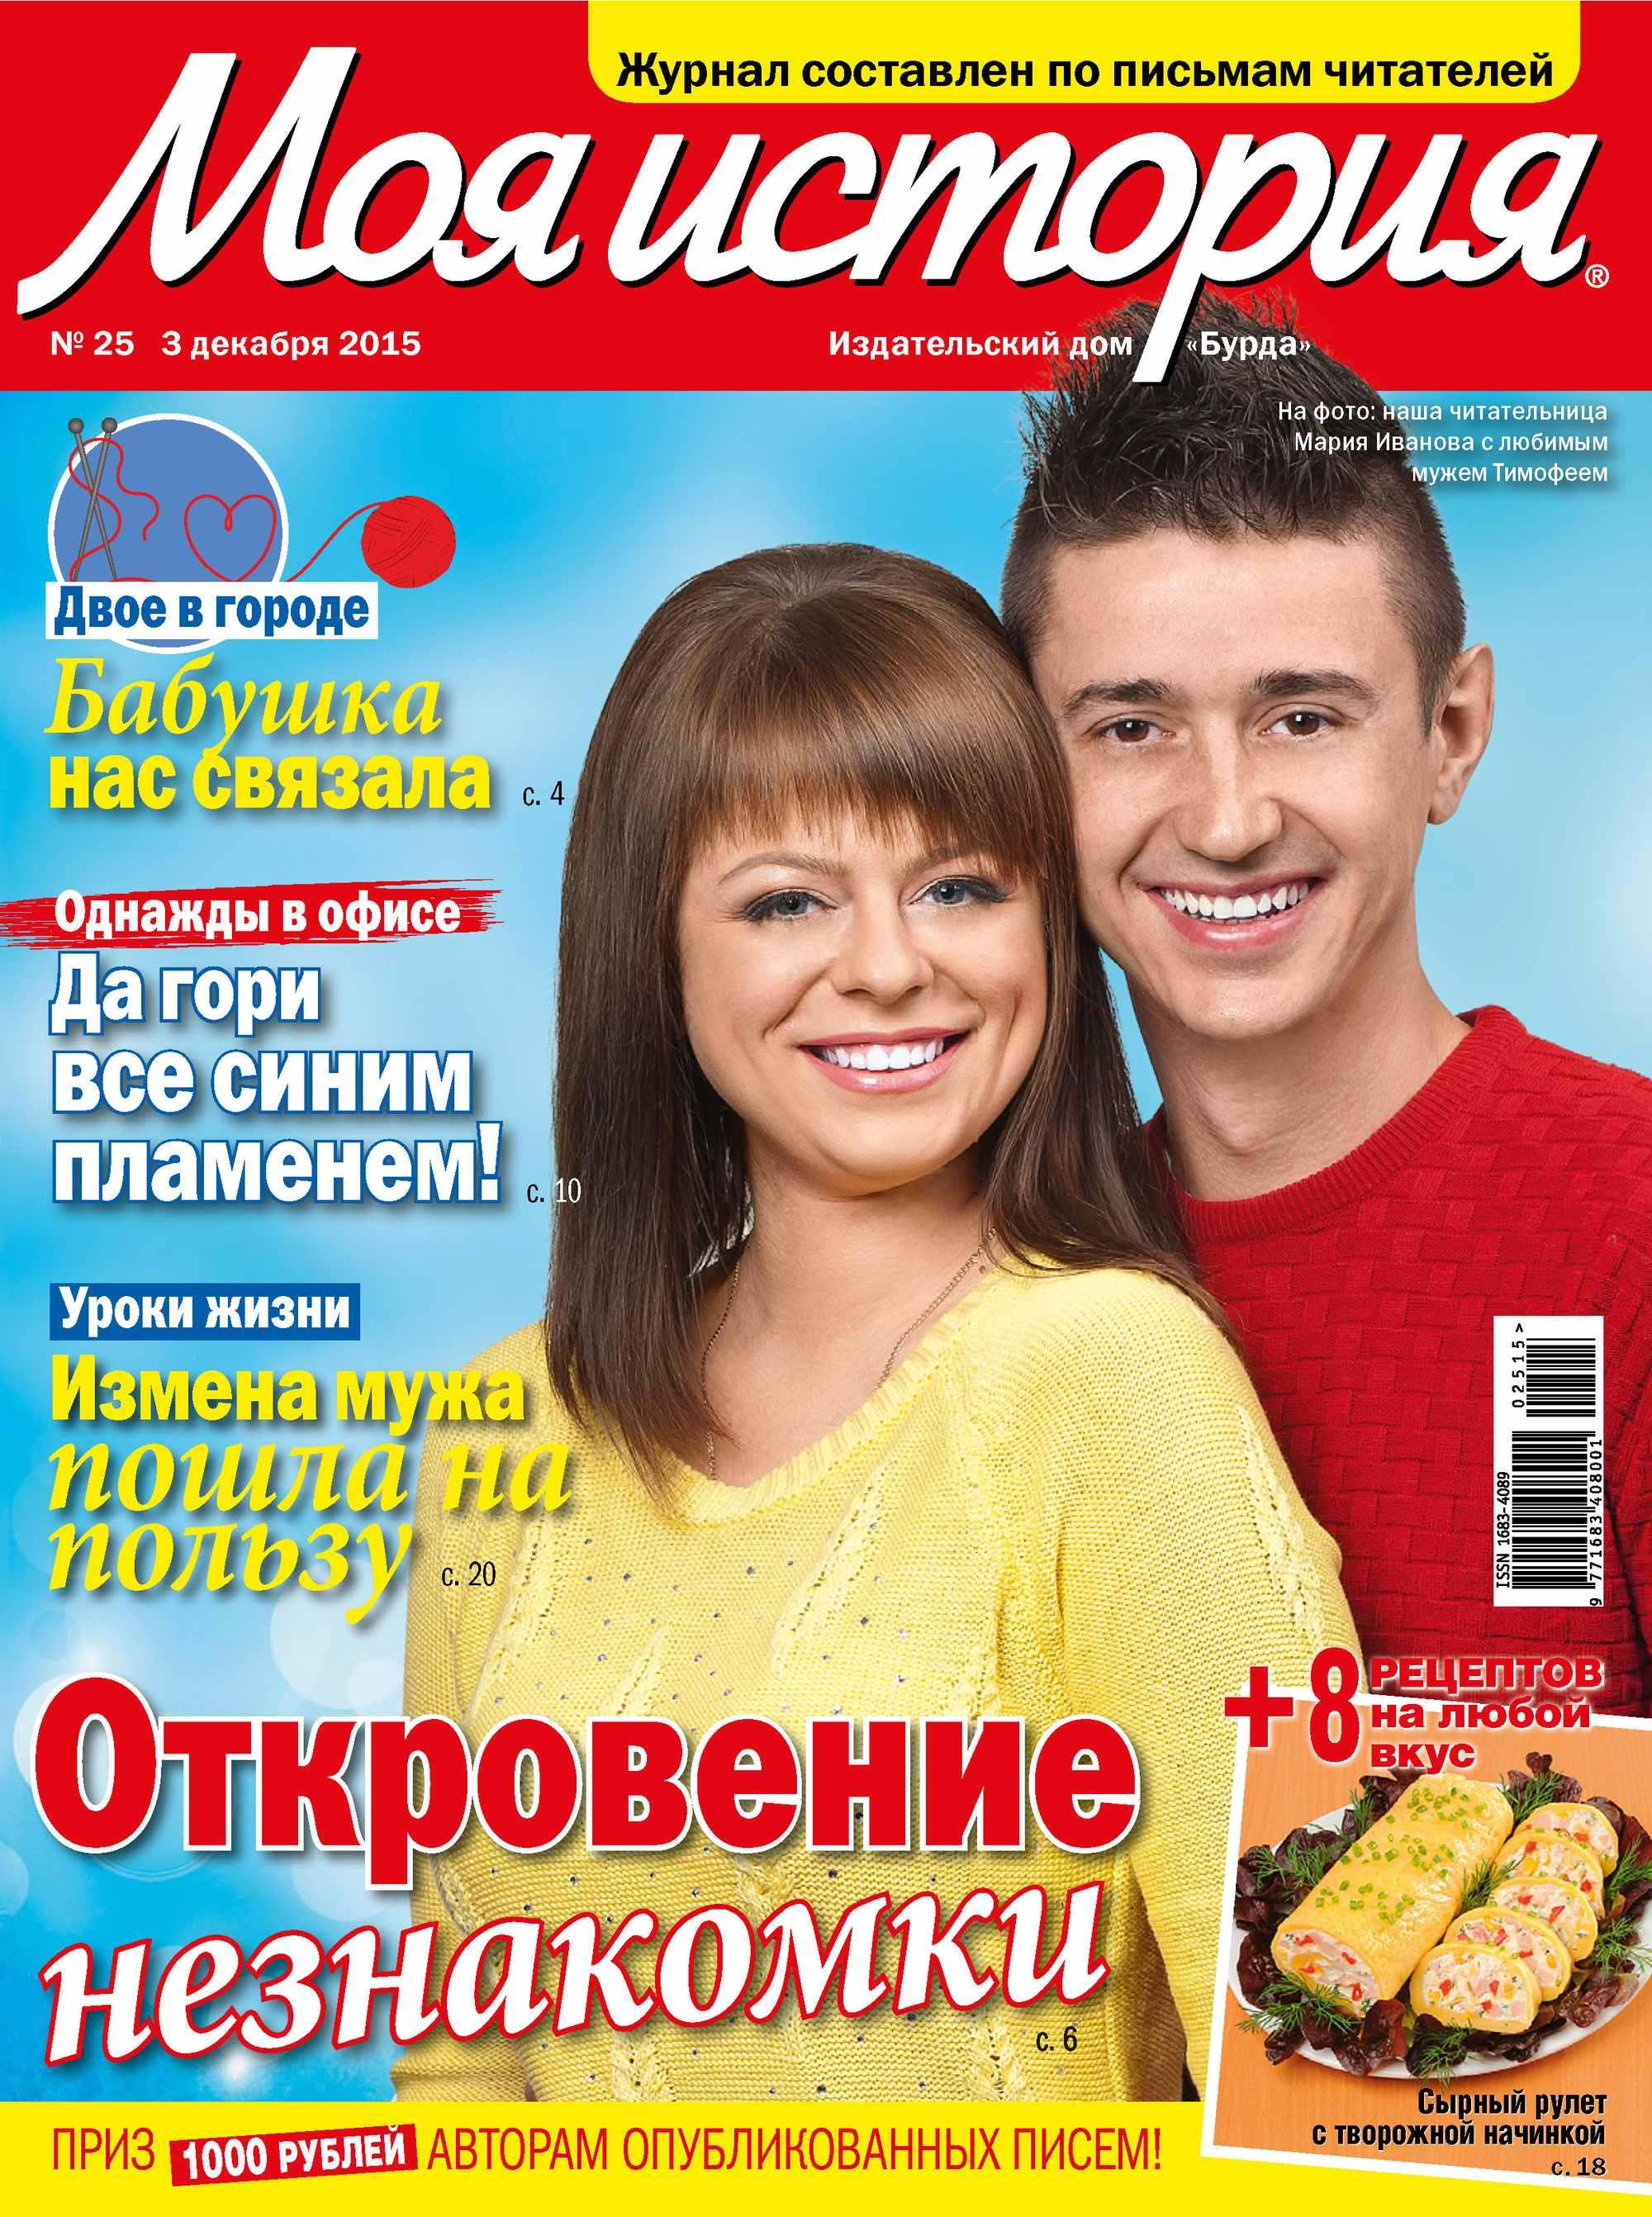 ИД «Бурда» Журнал «Моя история» №25/2015 ид бурда журнал моя история 23 2015